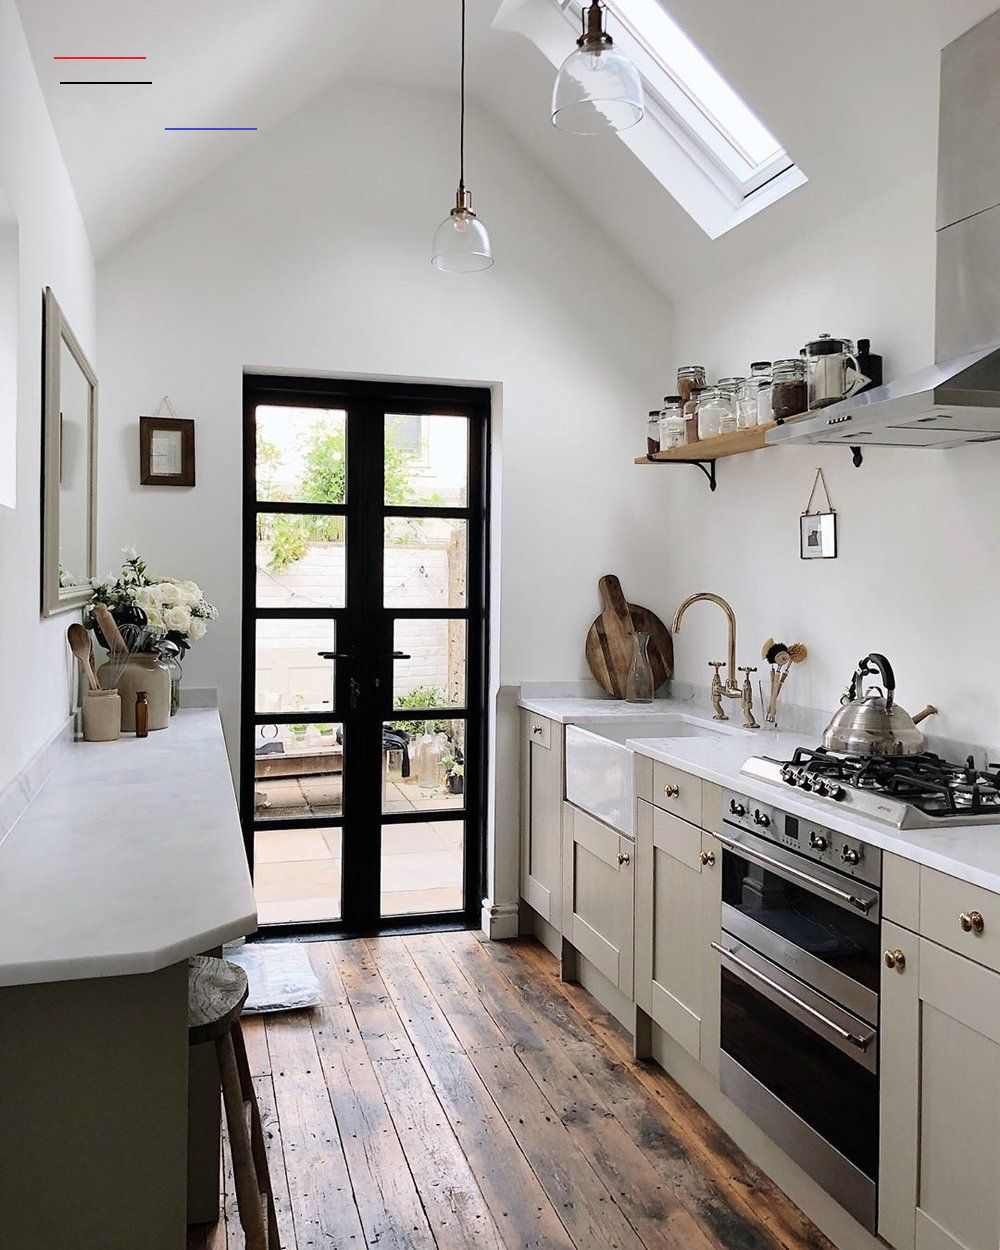 11 Beautiful Galley Kitchen Design Ideas Fifi Mcgee Interior Blogger Uk Galley In 2020 Gallery Kitchen Layout Galley Kitchen Design Kitchen Remodel Inspiration